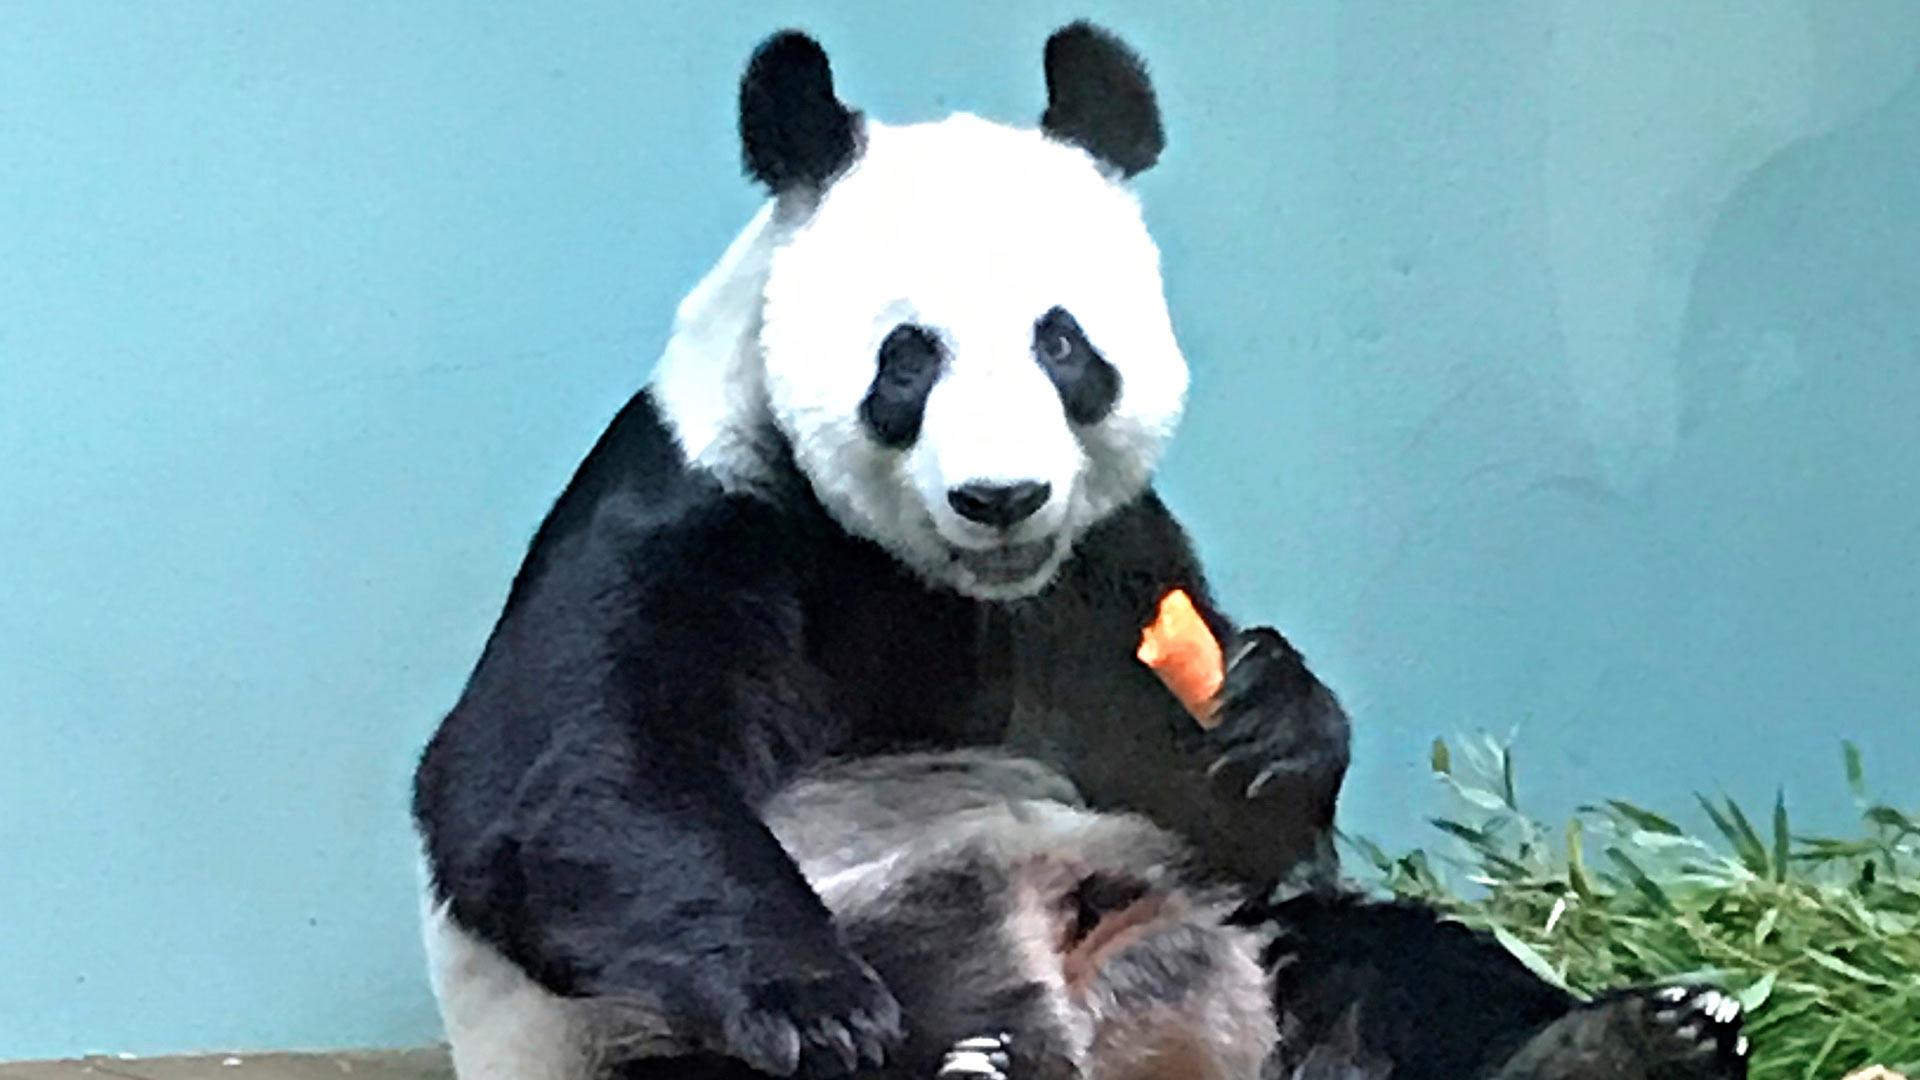 Edinburghin eläintarhan panda